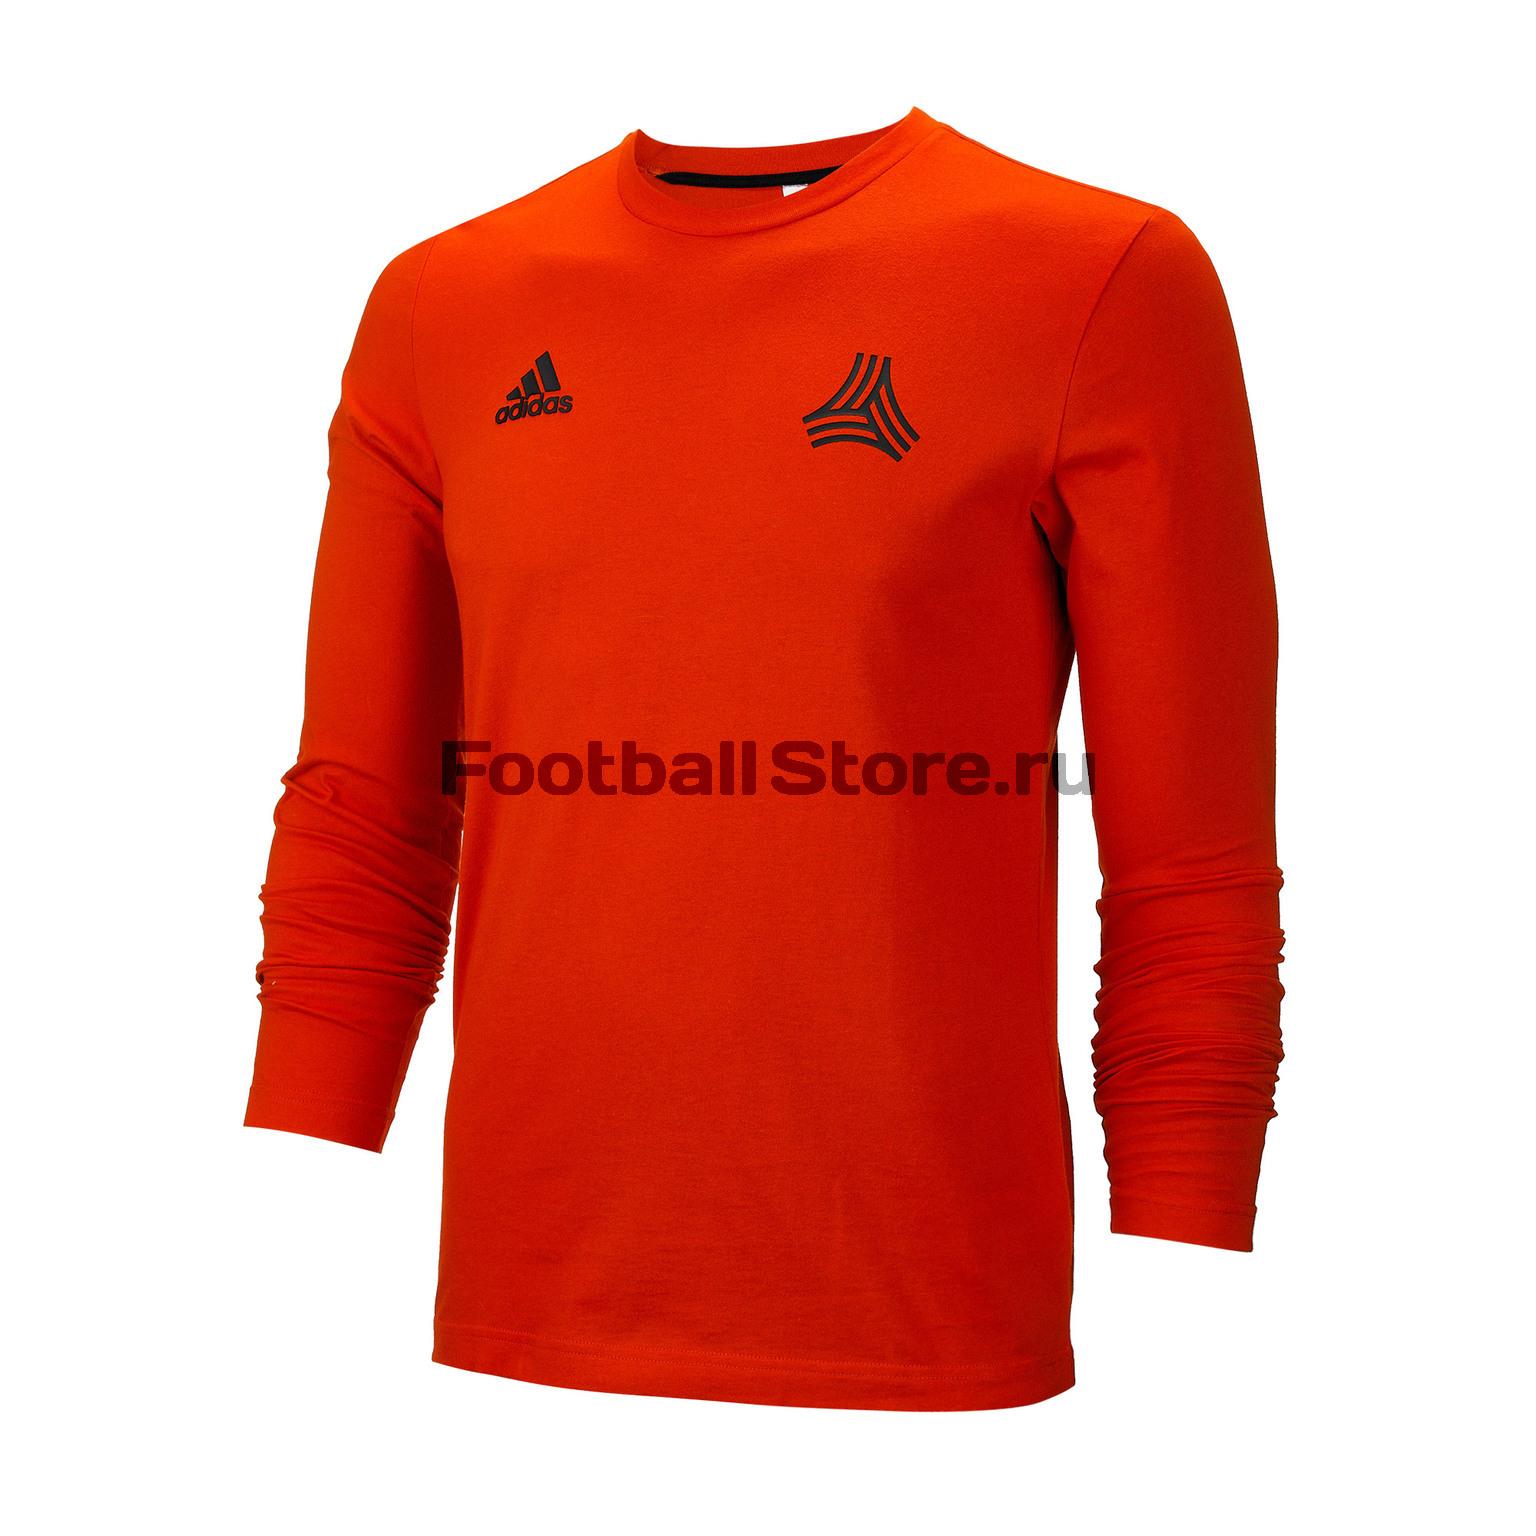 Футболка с длинным рукавом Adidas Tan Gr Tee LS DT9432 футболка с длинным рукавом asics 156859 0904 man long sleeve tee